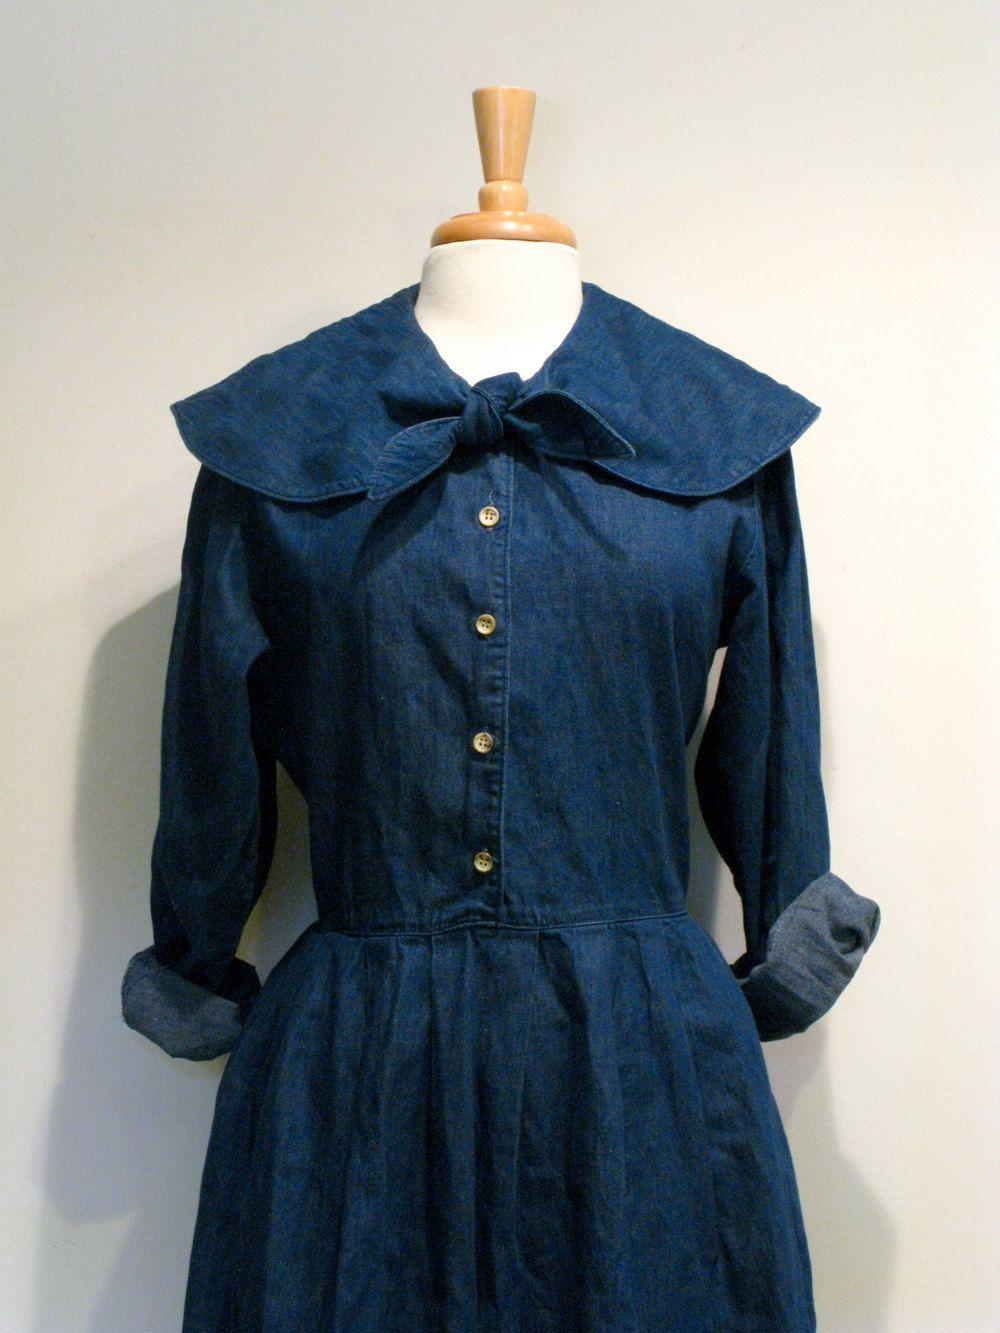 Denim Shirtwaist Dress with Sailor Collar.